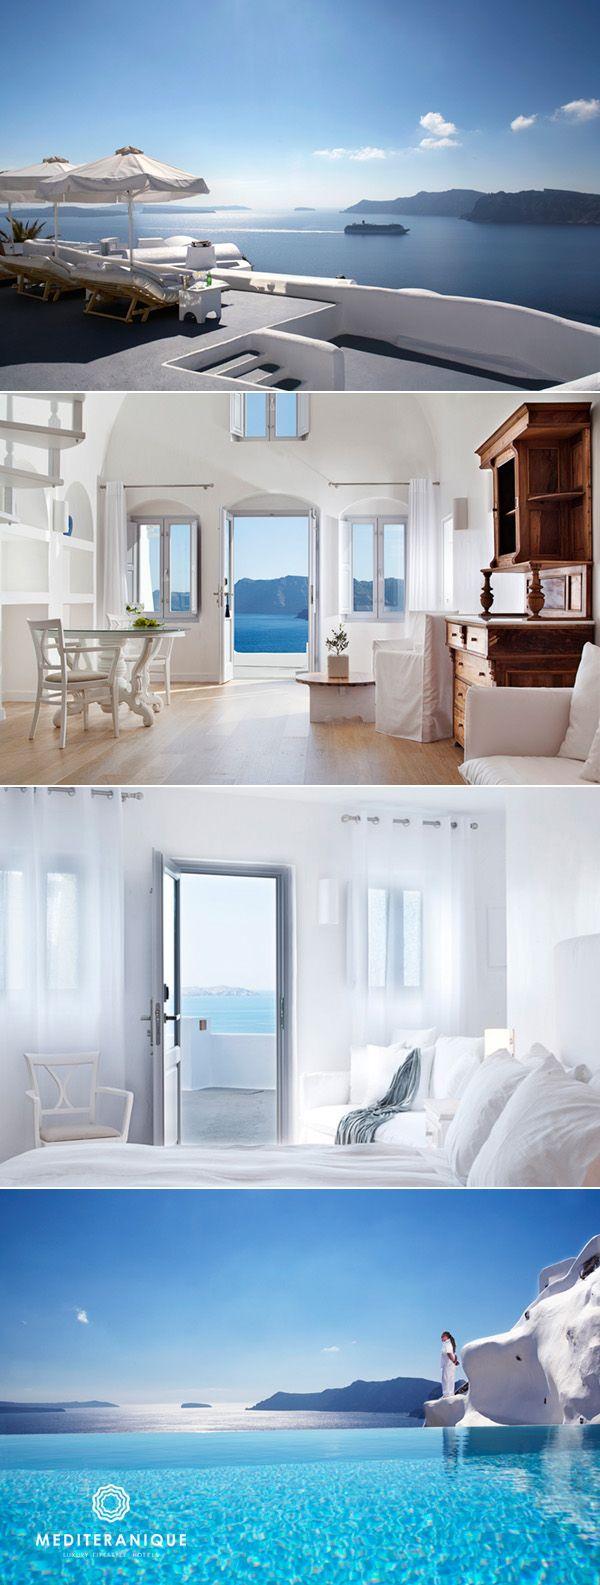 Katikies Hotel, Santorini, Greece http://www.mediteranique.com/hotels-greece/santorini/katikies-hotel/